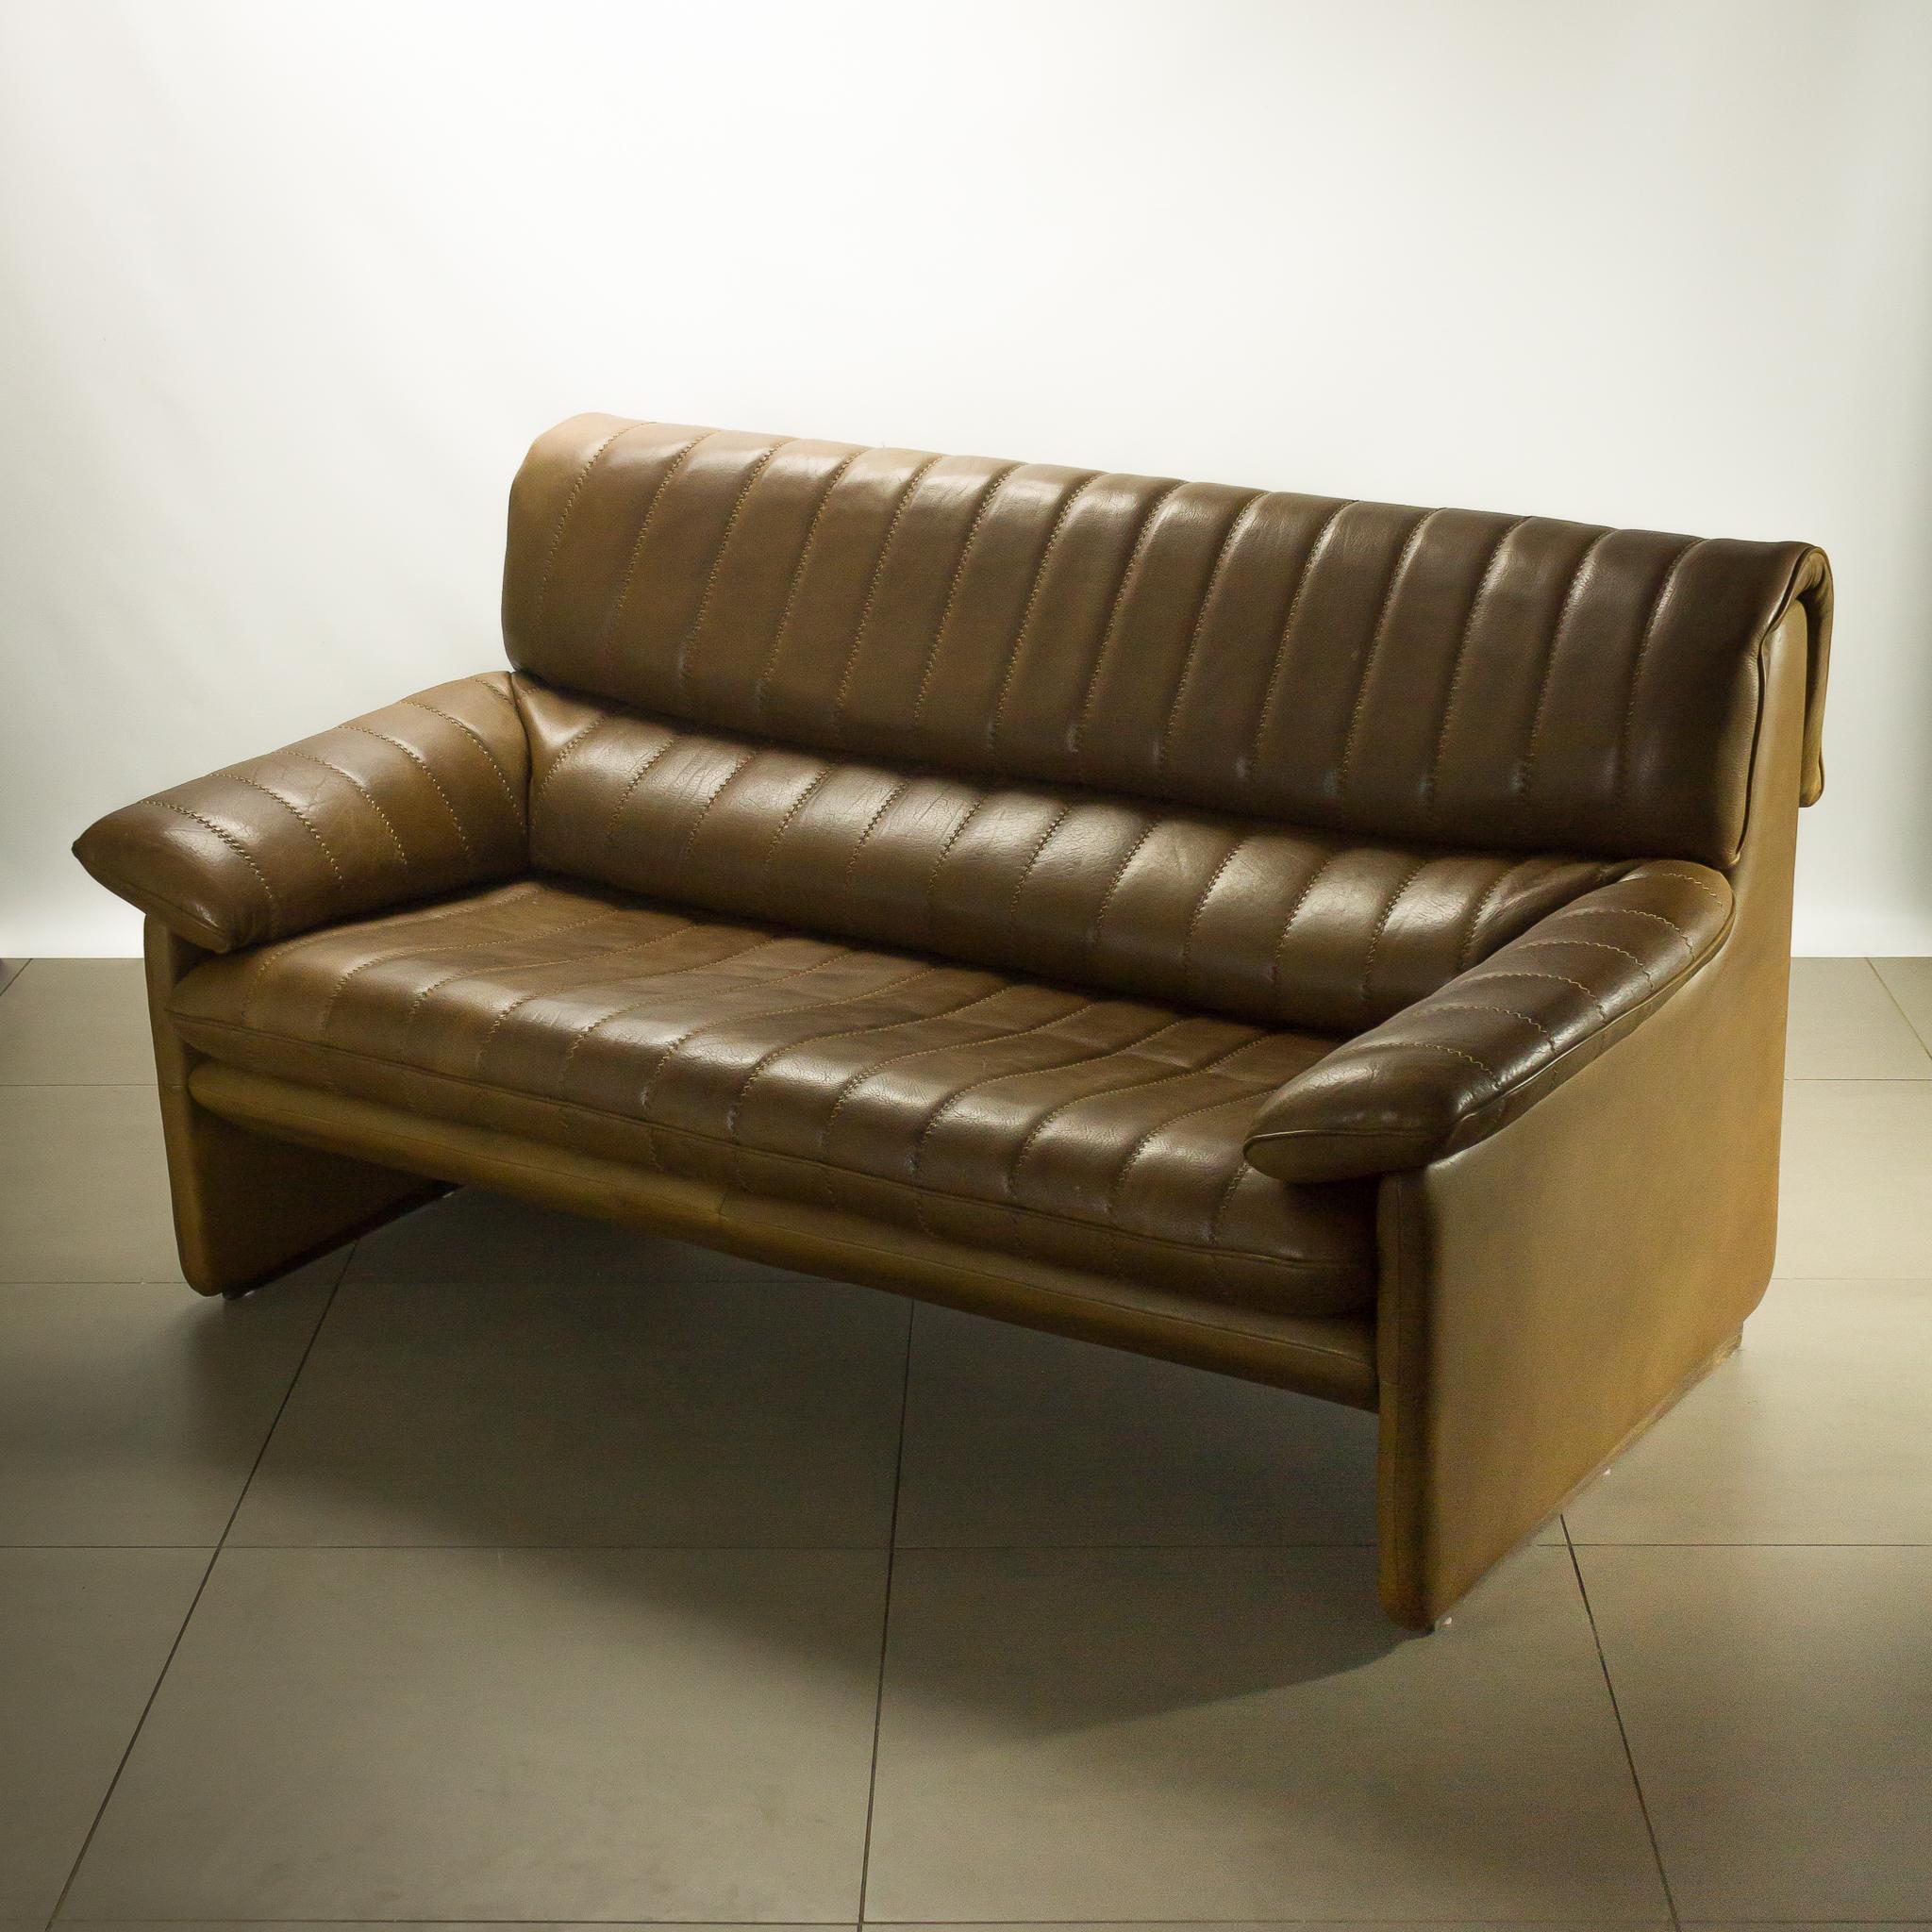 de sede ds 85 2 zits leren bank topstuk barbmama. Black Bedroom Furniture Sets. Home Design Ideas